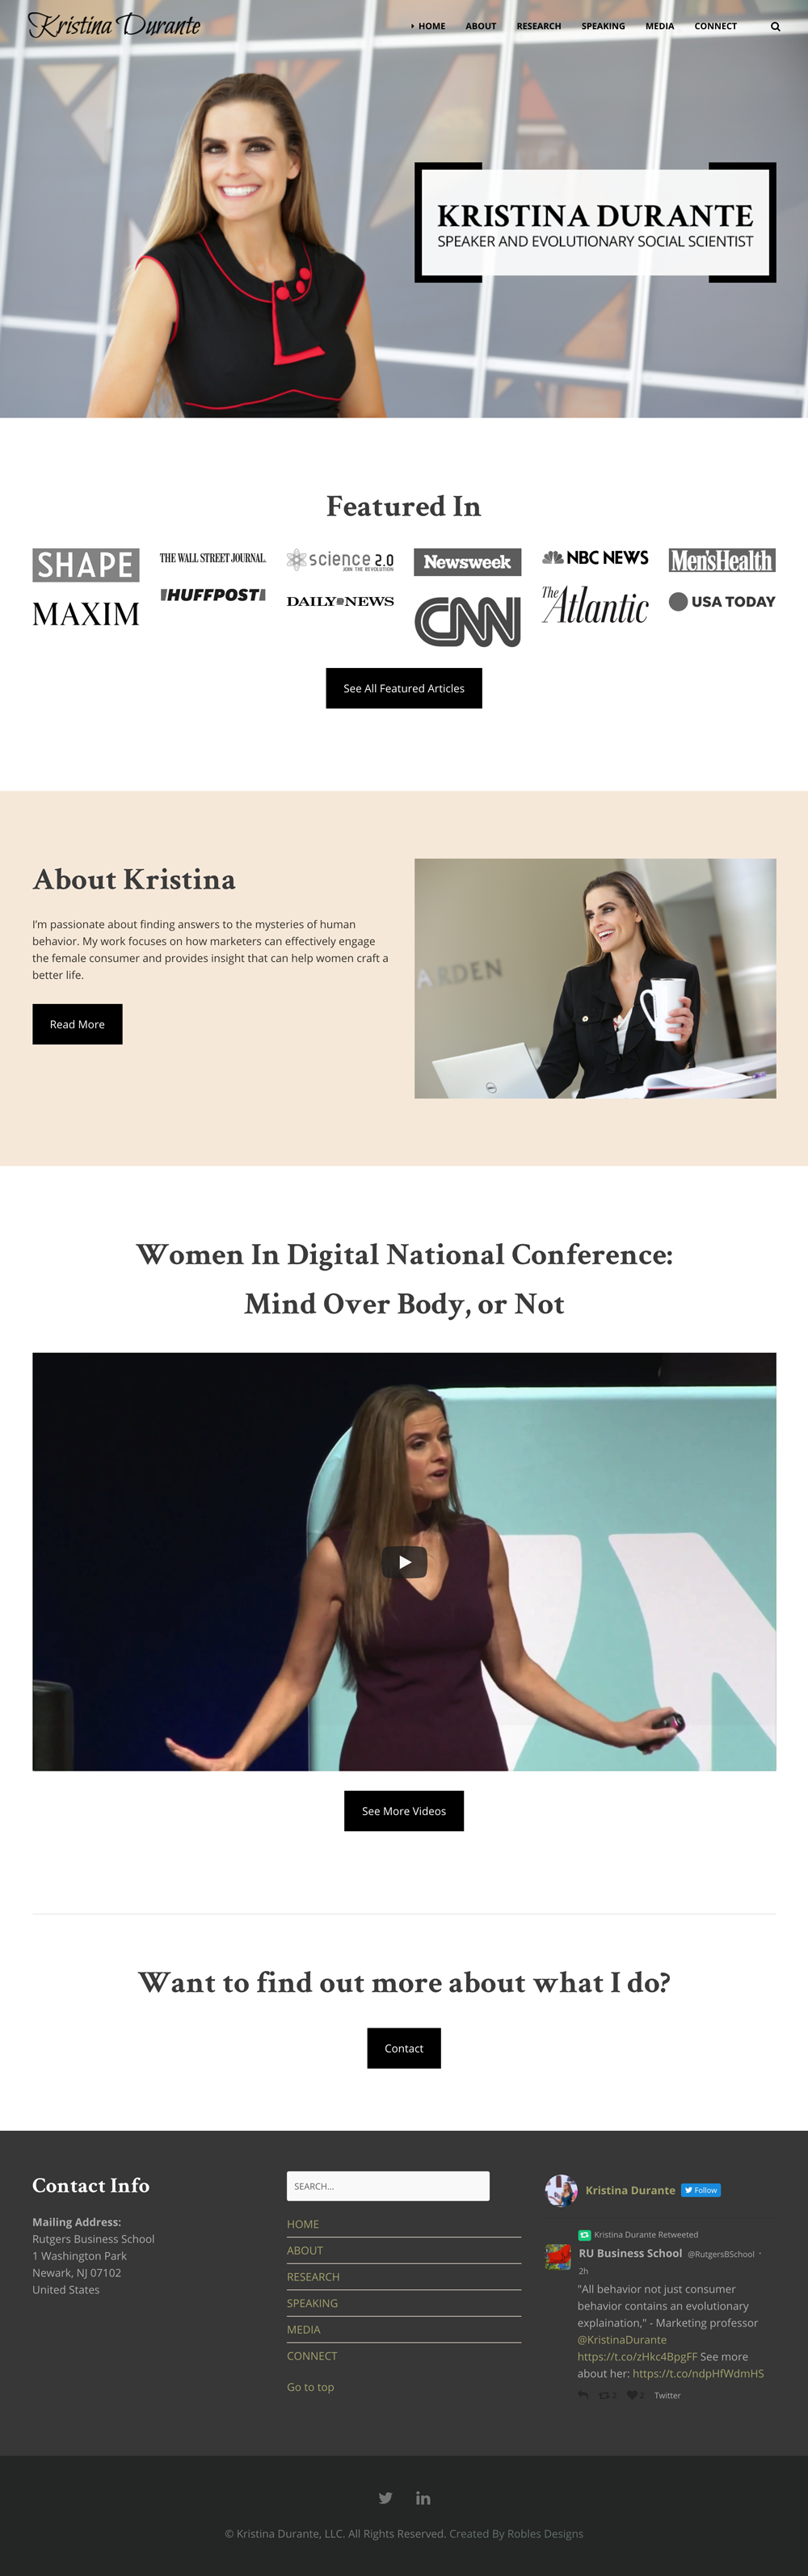 Kristina Durante Website